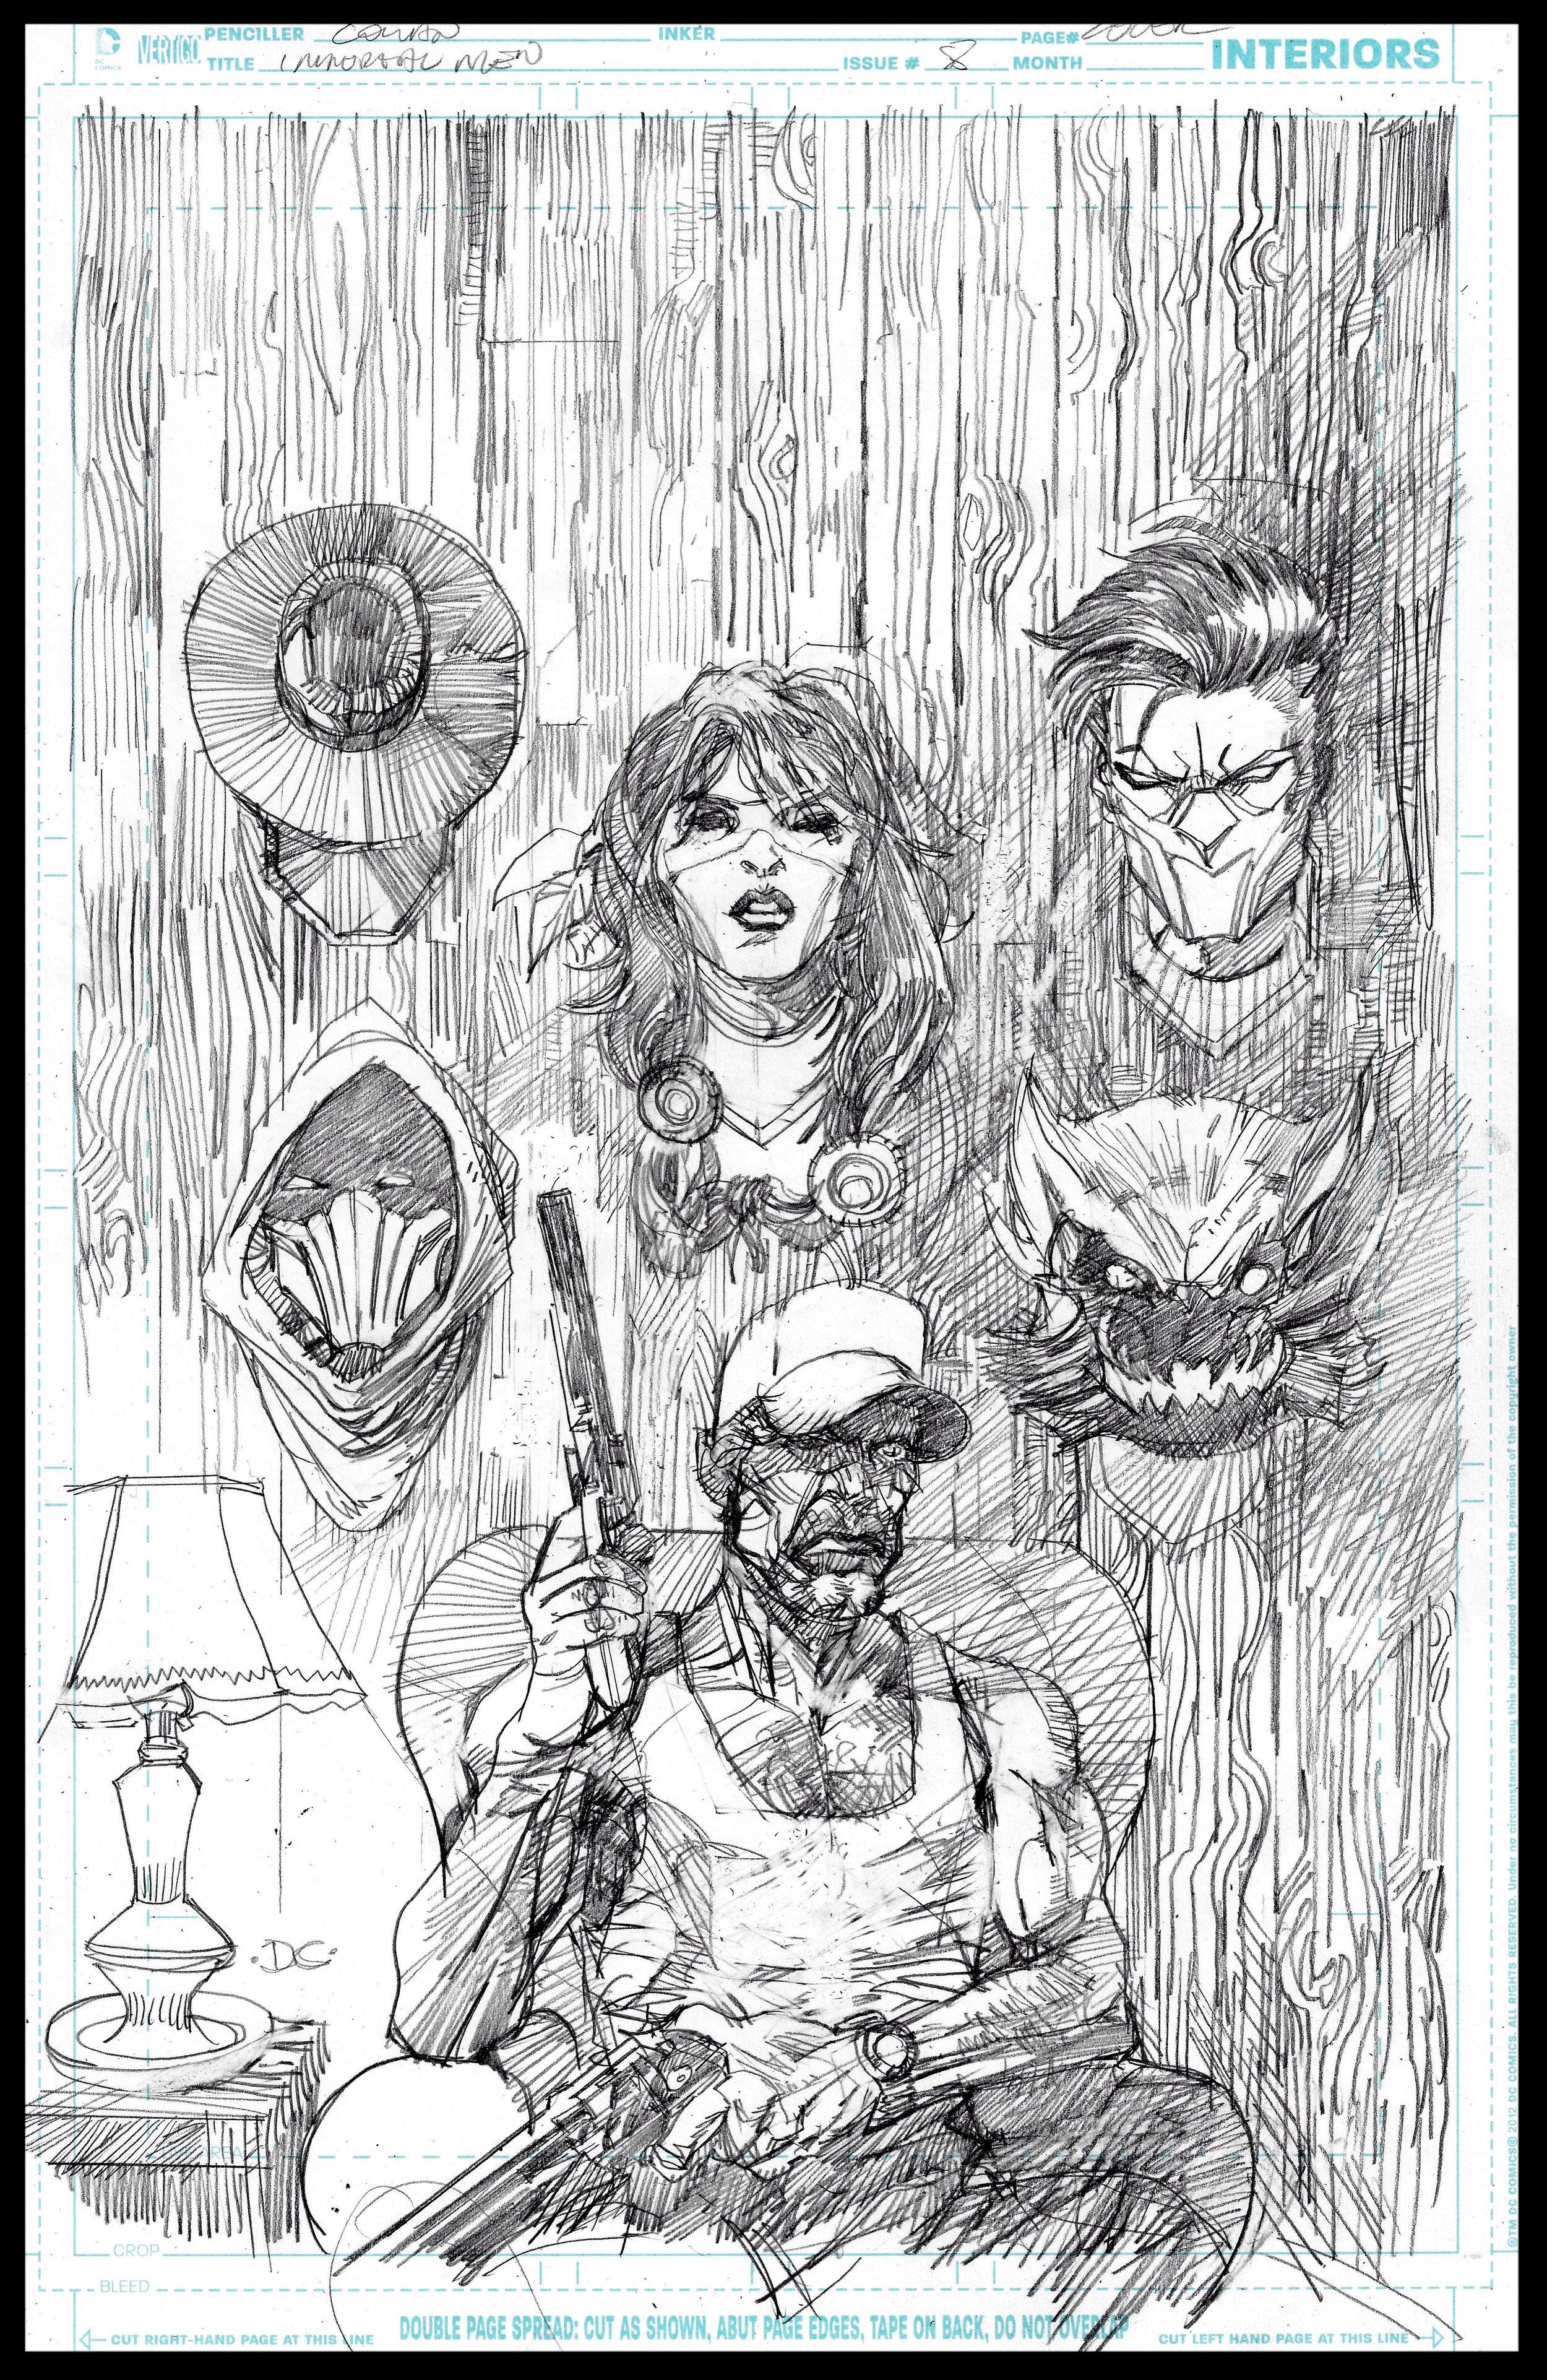 Immortal Men #8 (unpublished) - Cover - Pencils